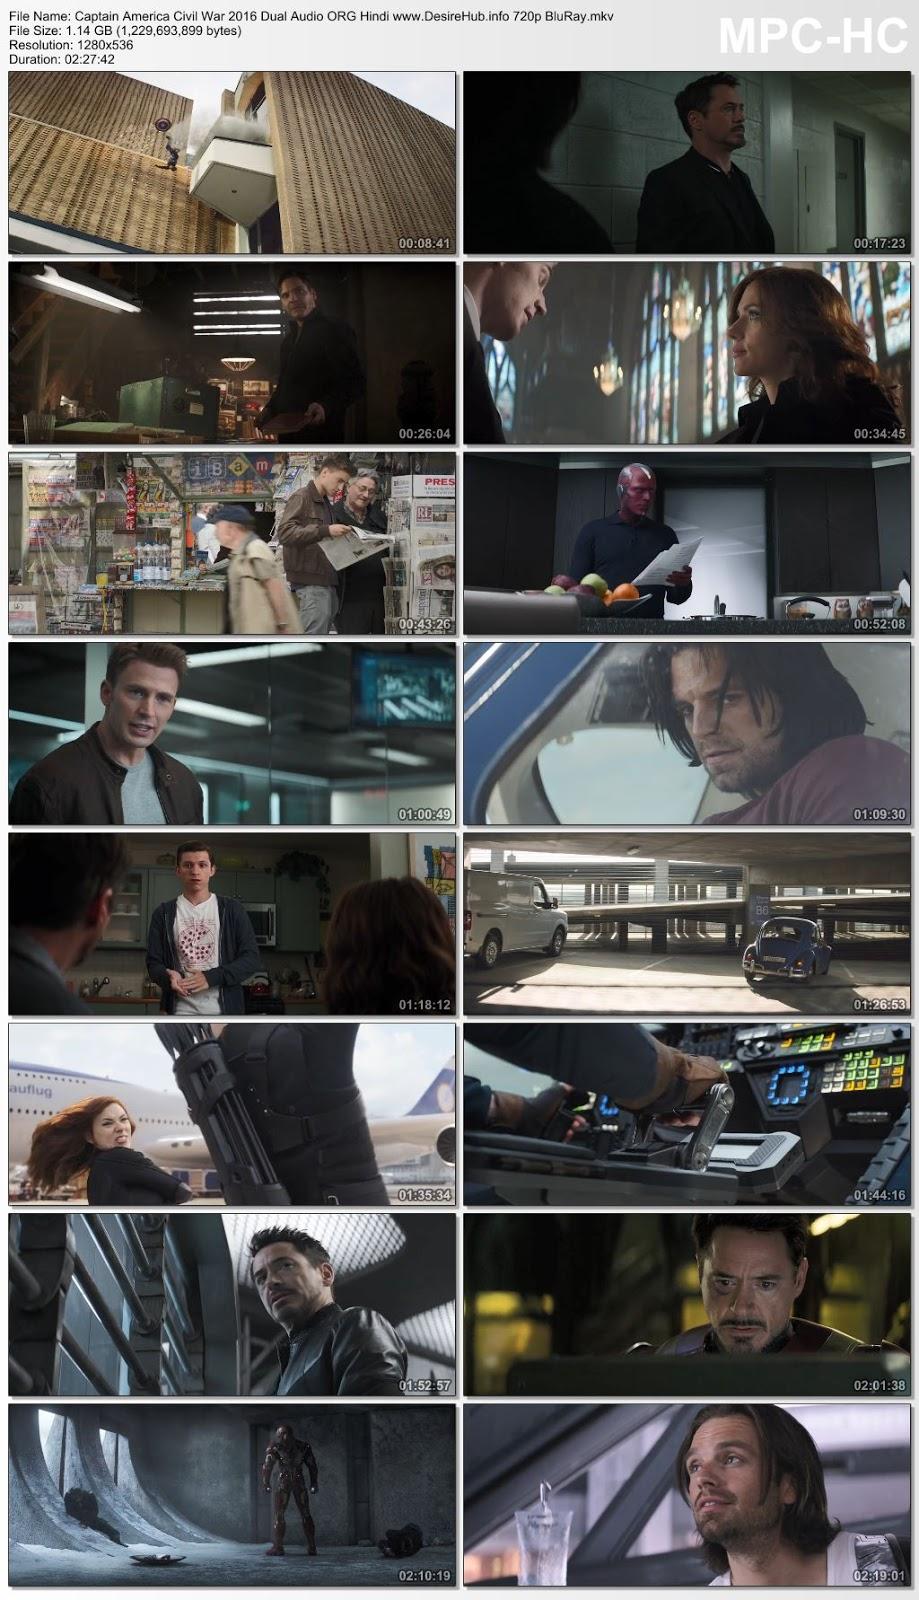 Captain America Civil War 2016 Dual Audio ORG Hindi 720p BluRay 1.1GB Desirehub